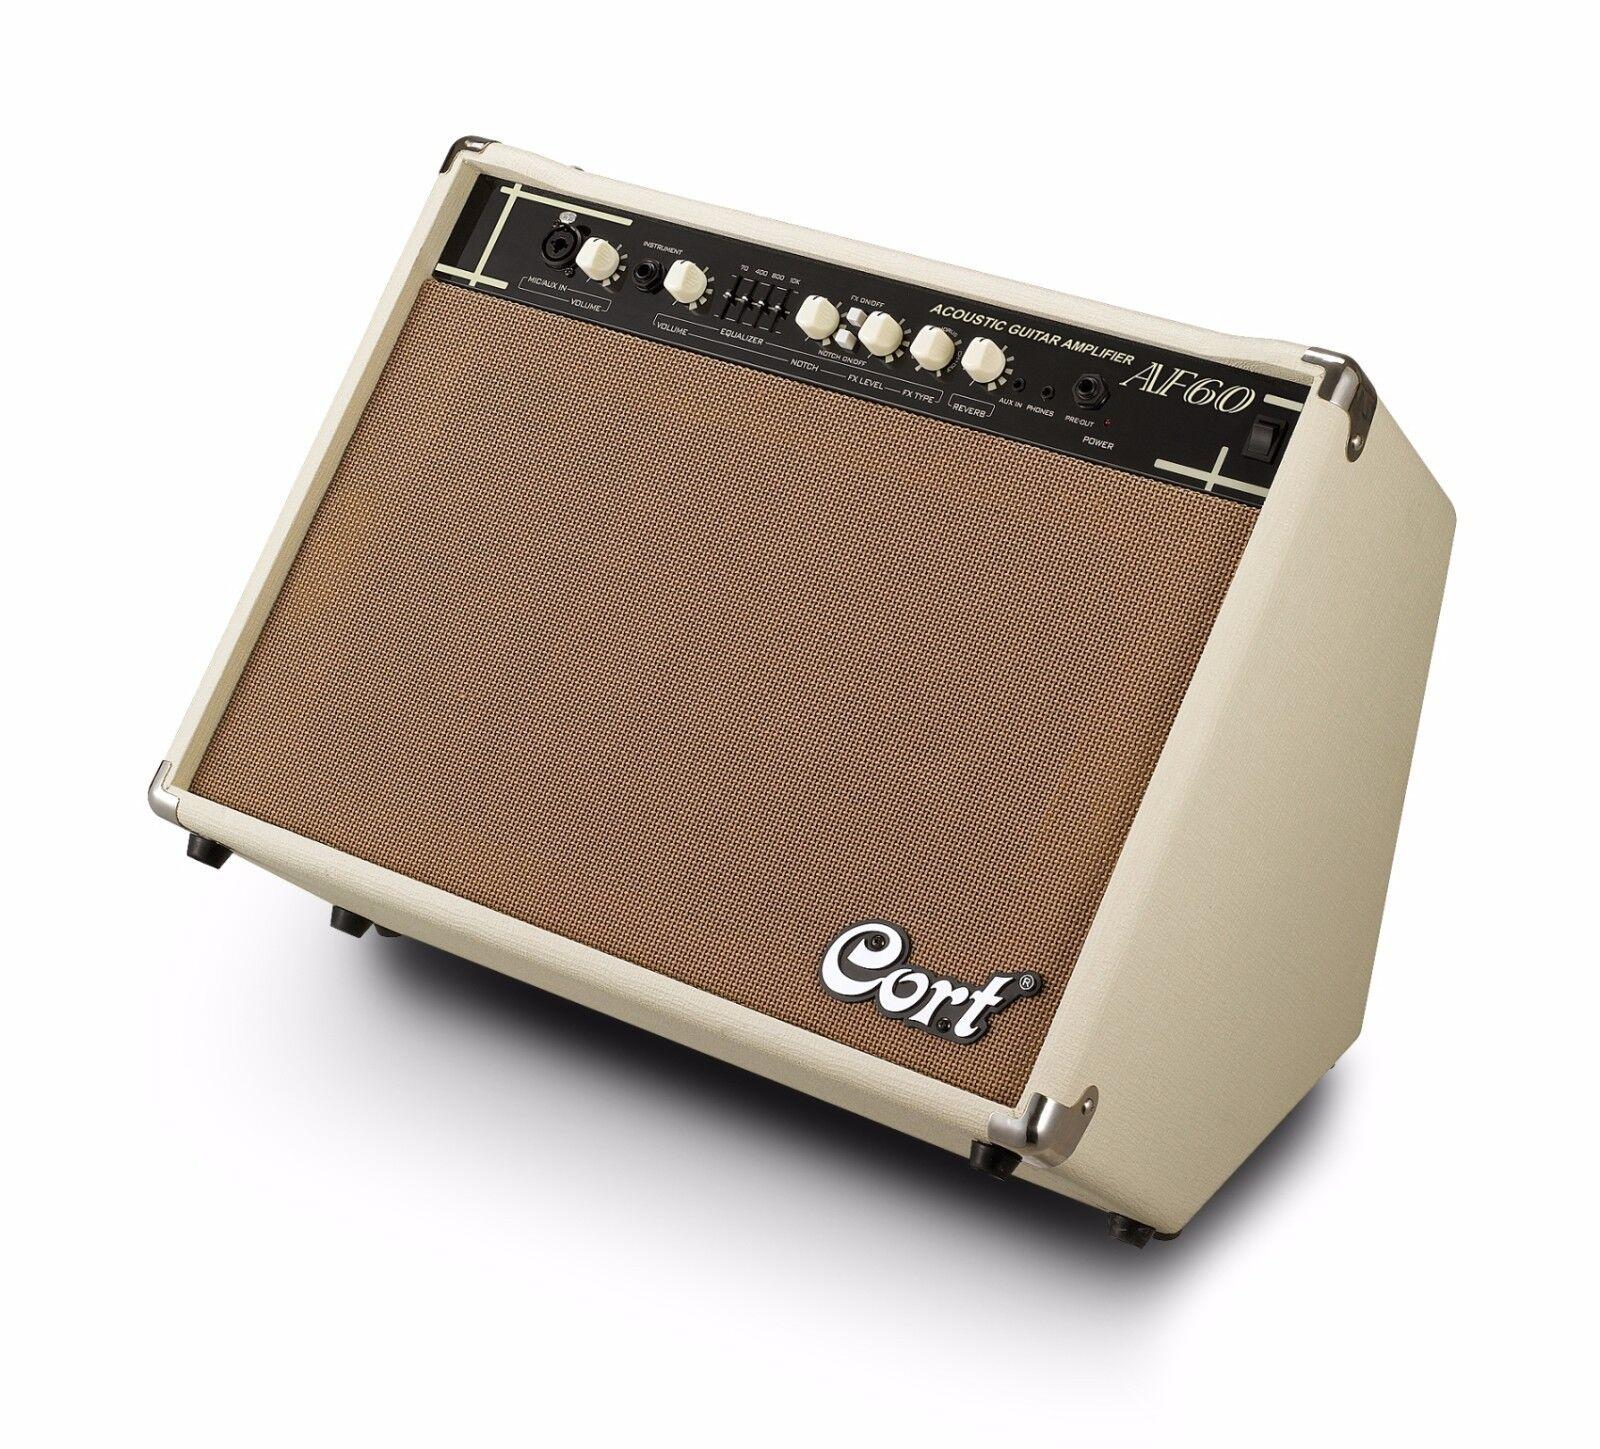 Cort af60 guitarras acústicas amplificador guitarras  acústicas combo, 2 canal AMP  nuevo  guitarras 88583e